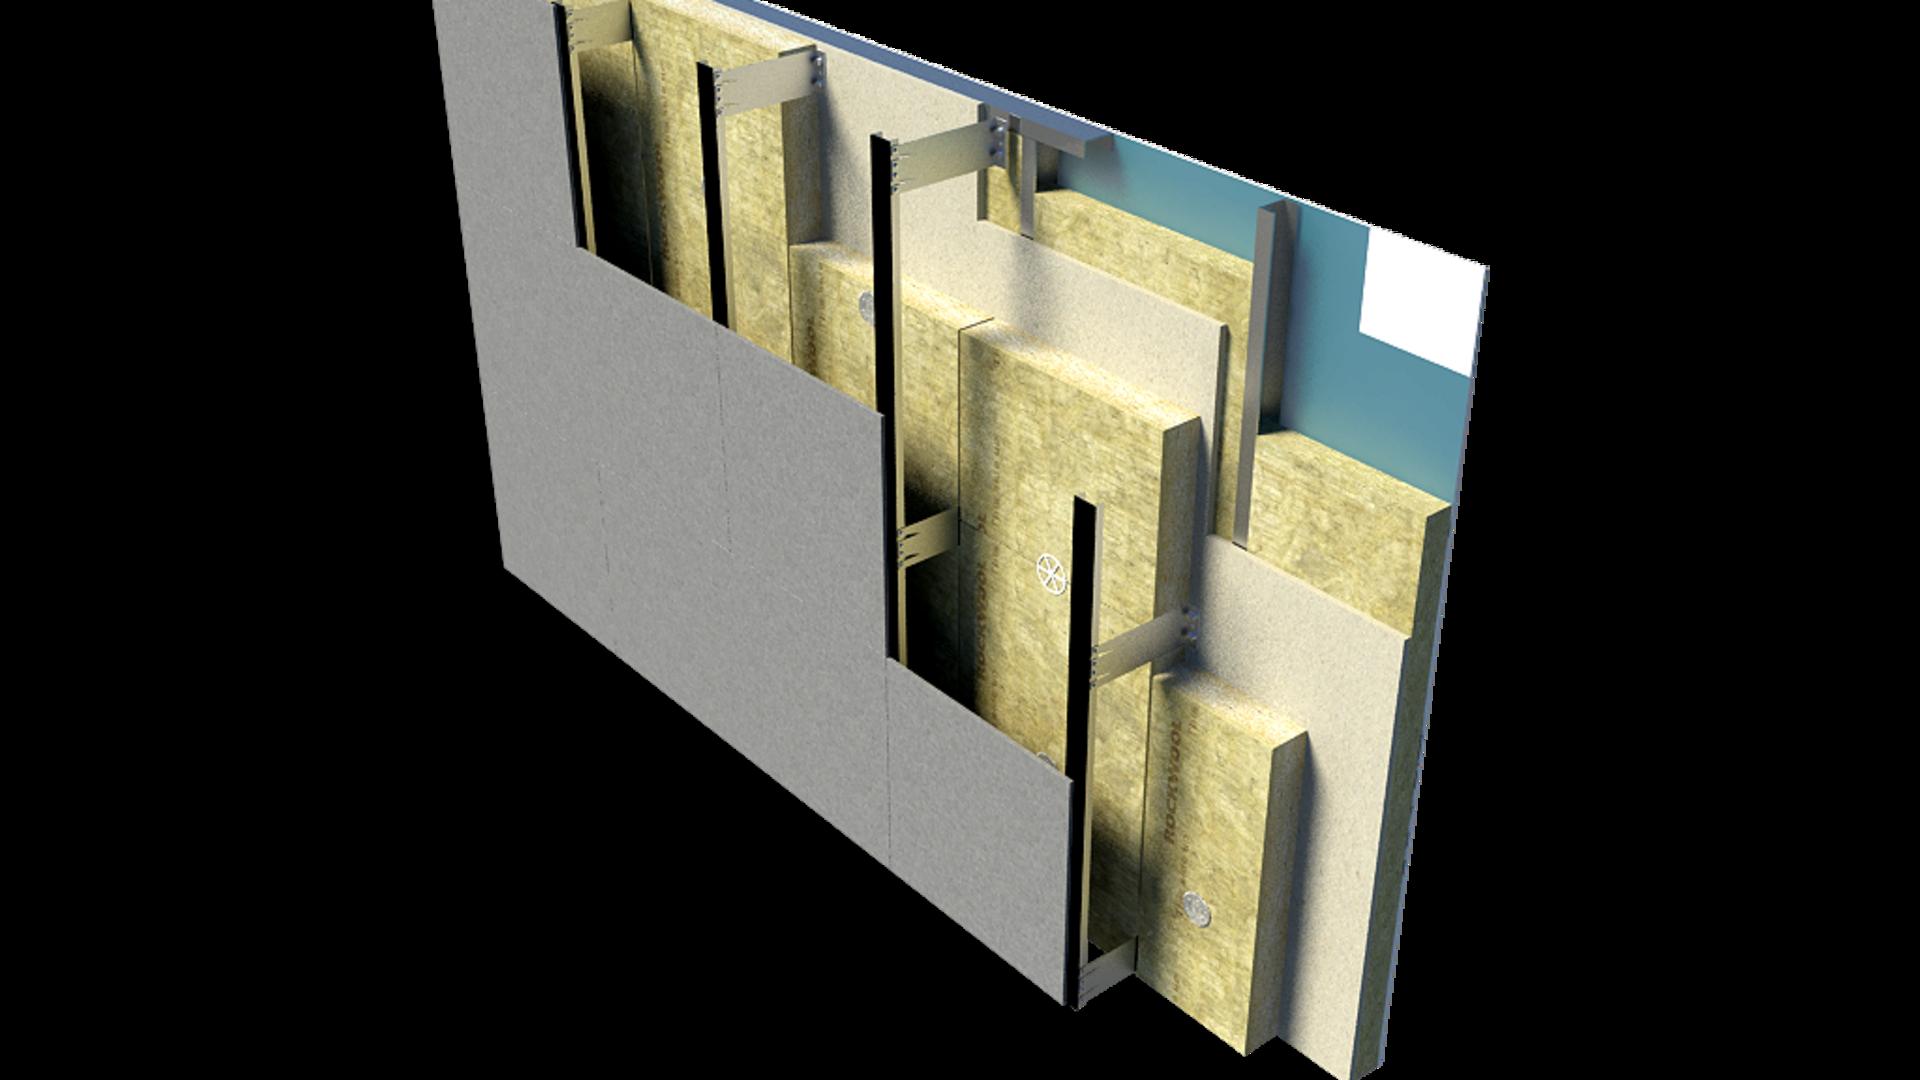 Rainscreen Cladding Roll Systems, Rainscreen Lightweight Steel Frame System, RAINSCREEN DUO SLAB